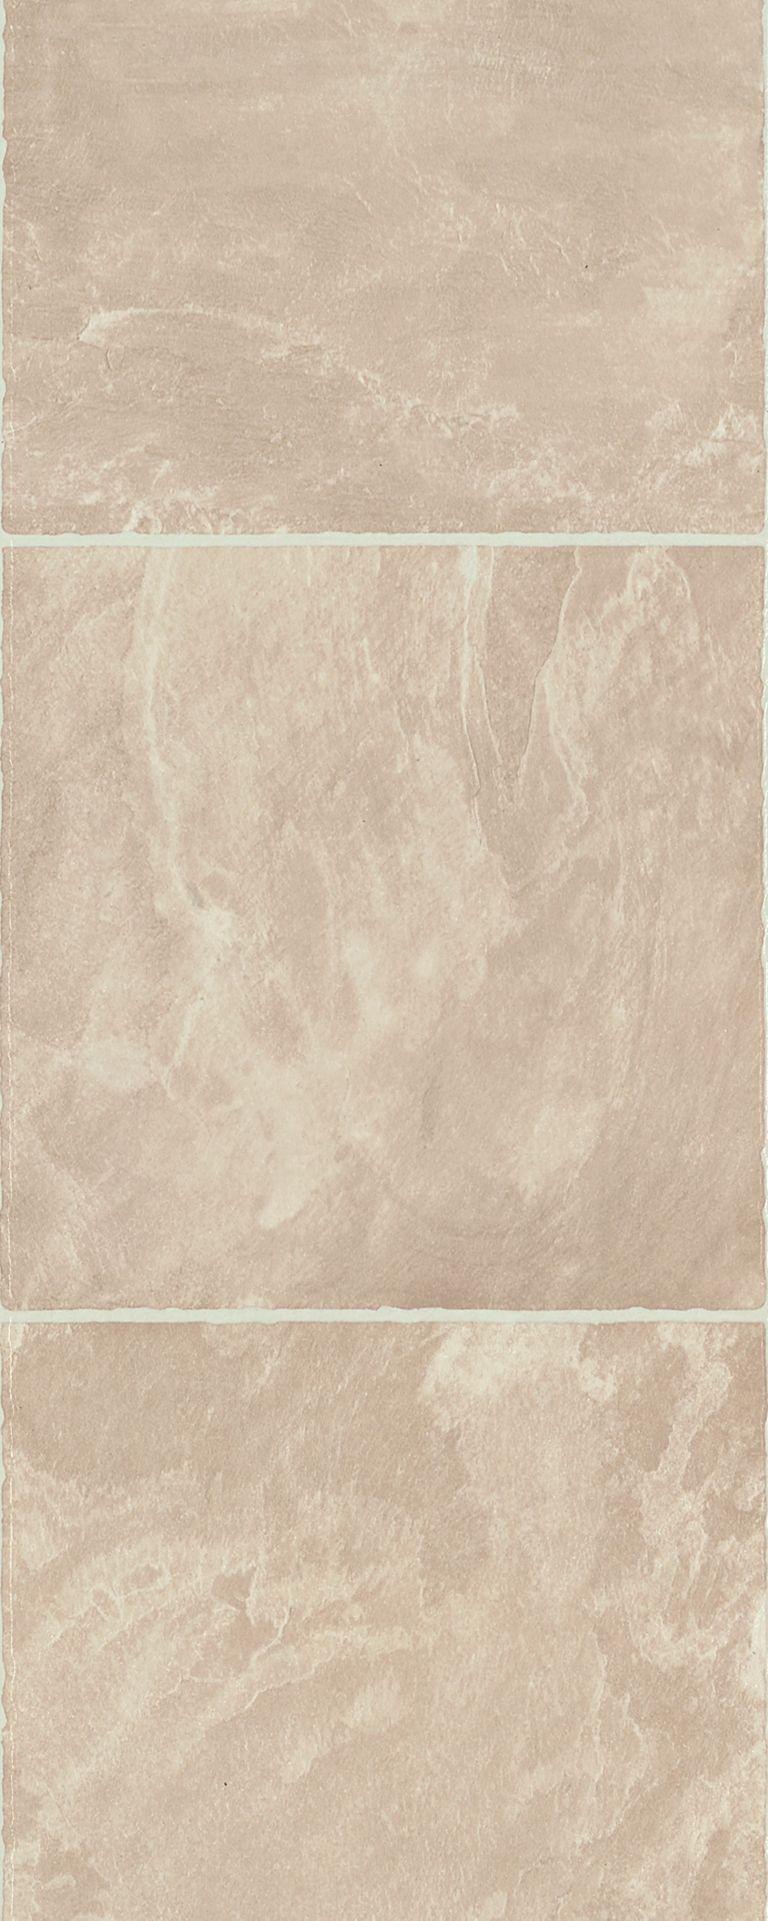 Slate - Natural Beige Laminado L6571